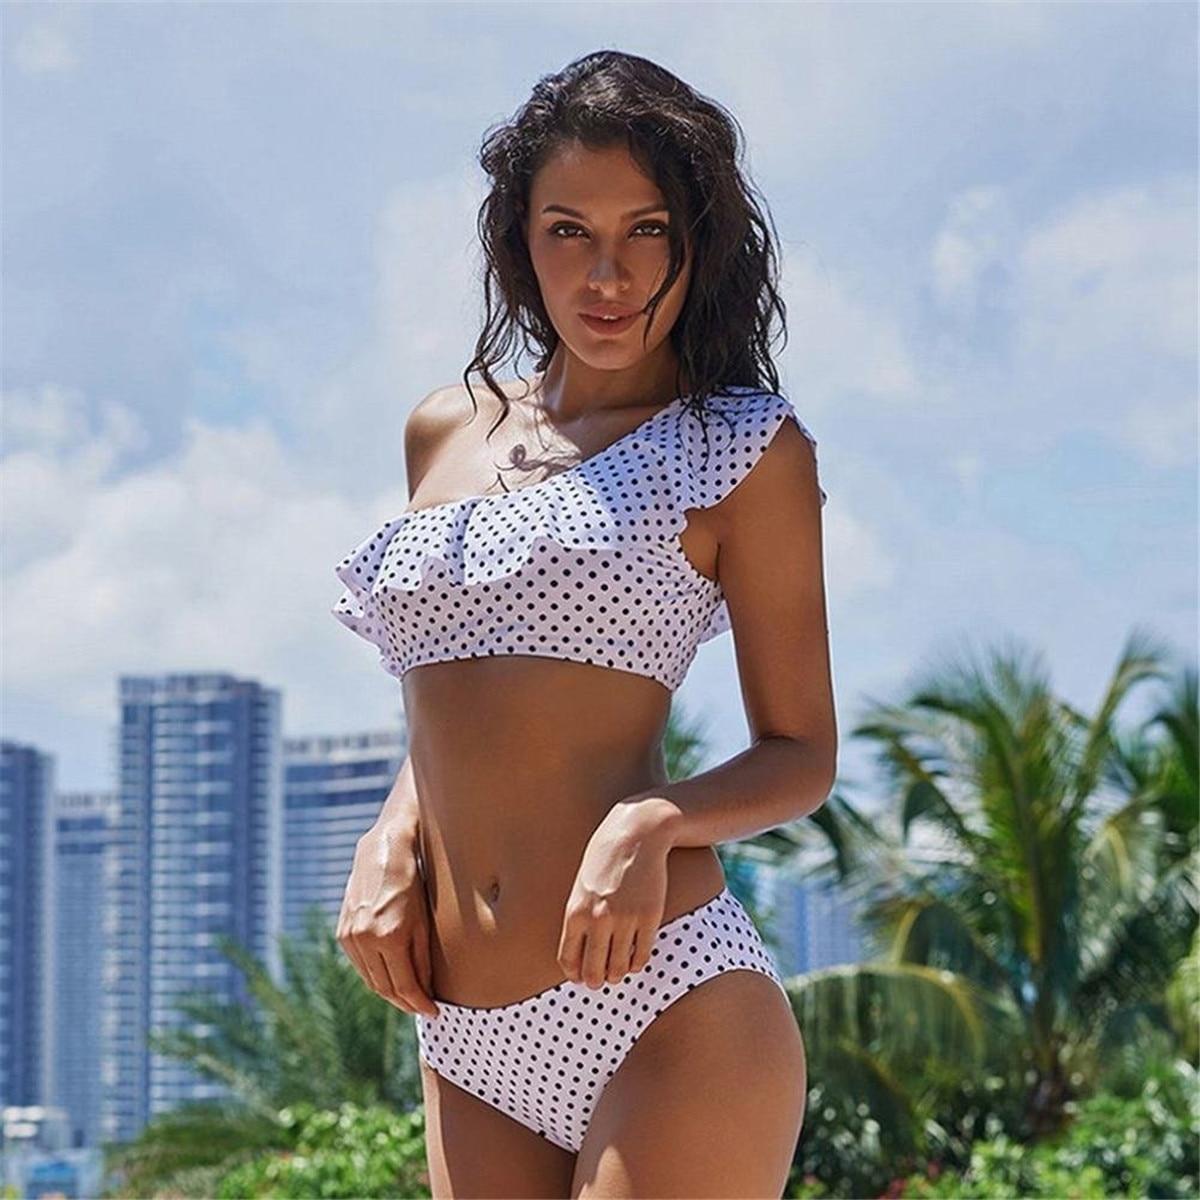 2018 Schulter Volant Bikini bickinis mujer Rüschen Bademode Dot Druck Brazilian Bikini Set Striped Print bickinis mujer